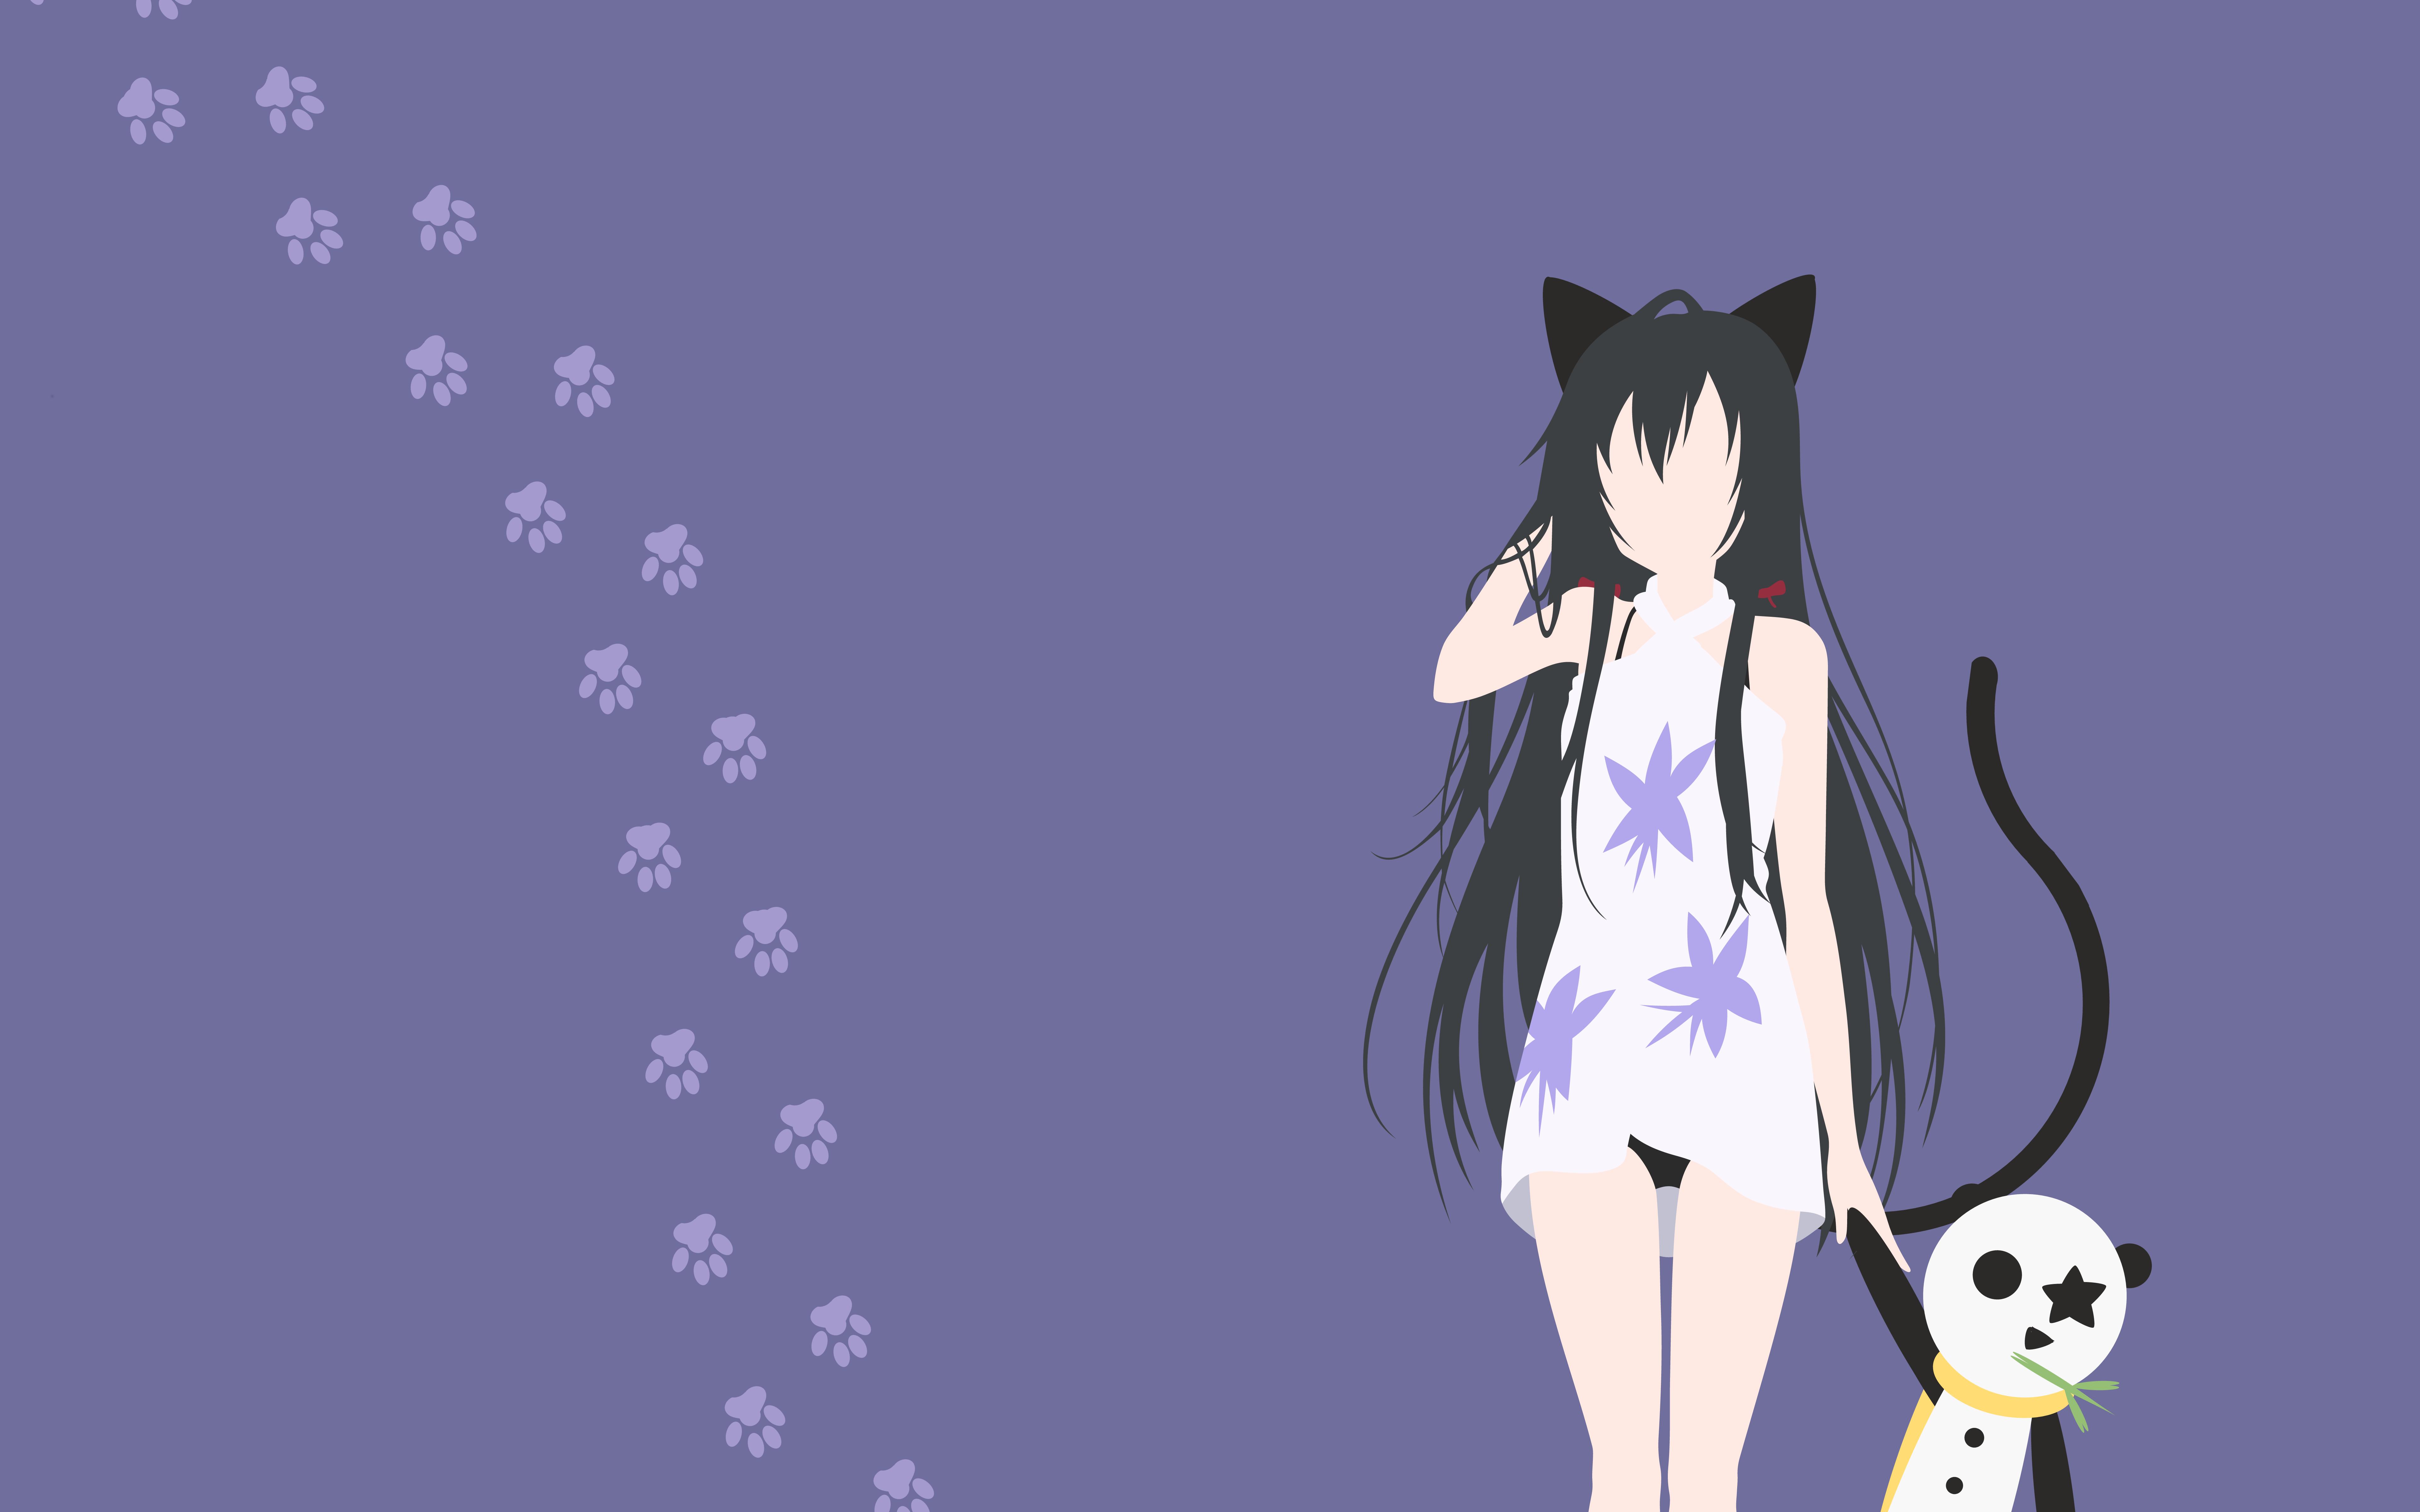 Unduh 770+ Wallpaper Anime Oregairu Hd HD Terbaik